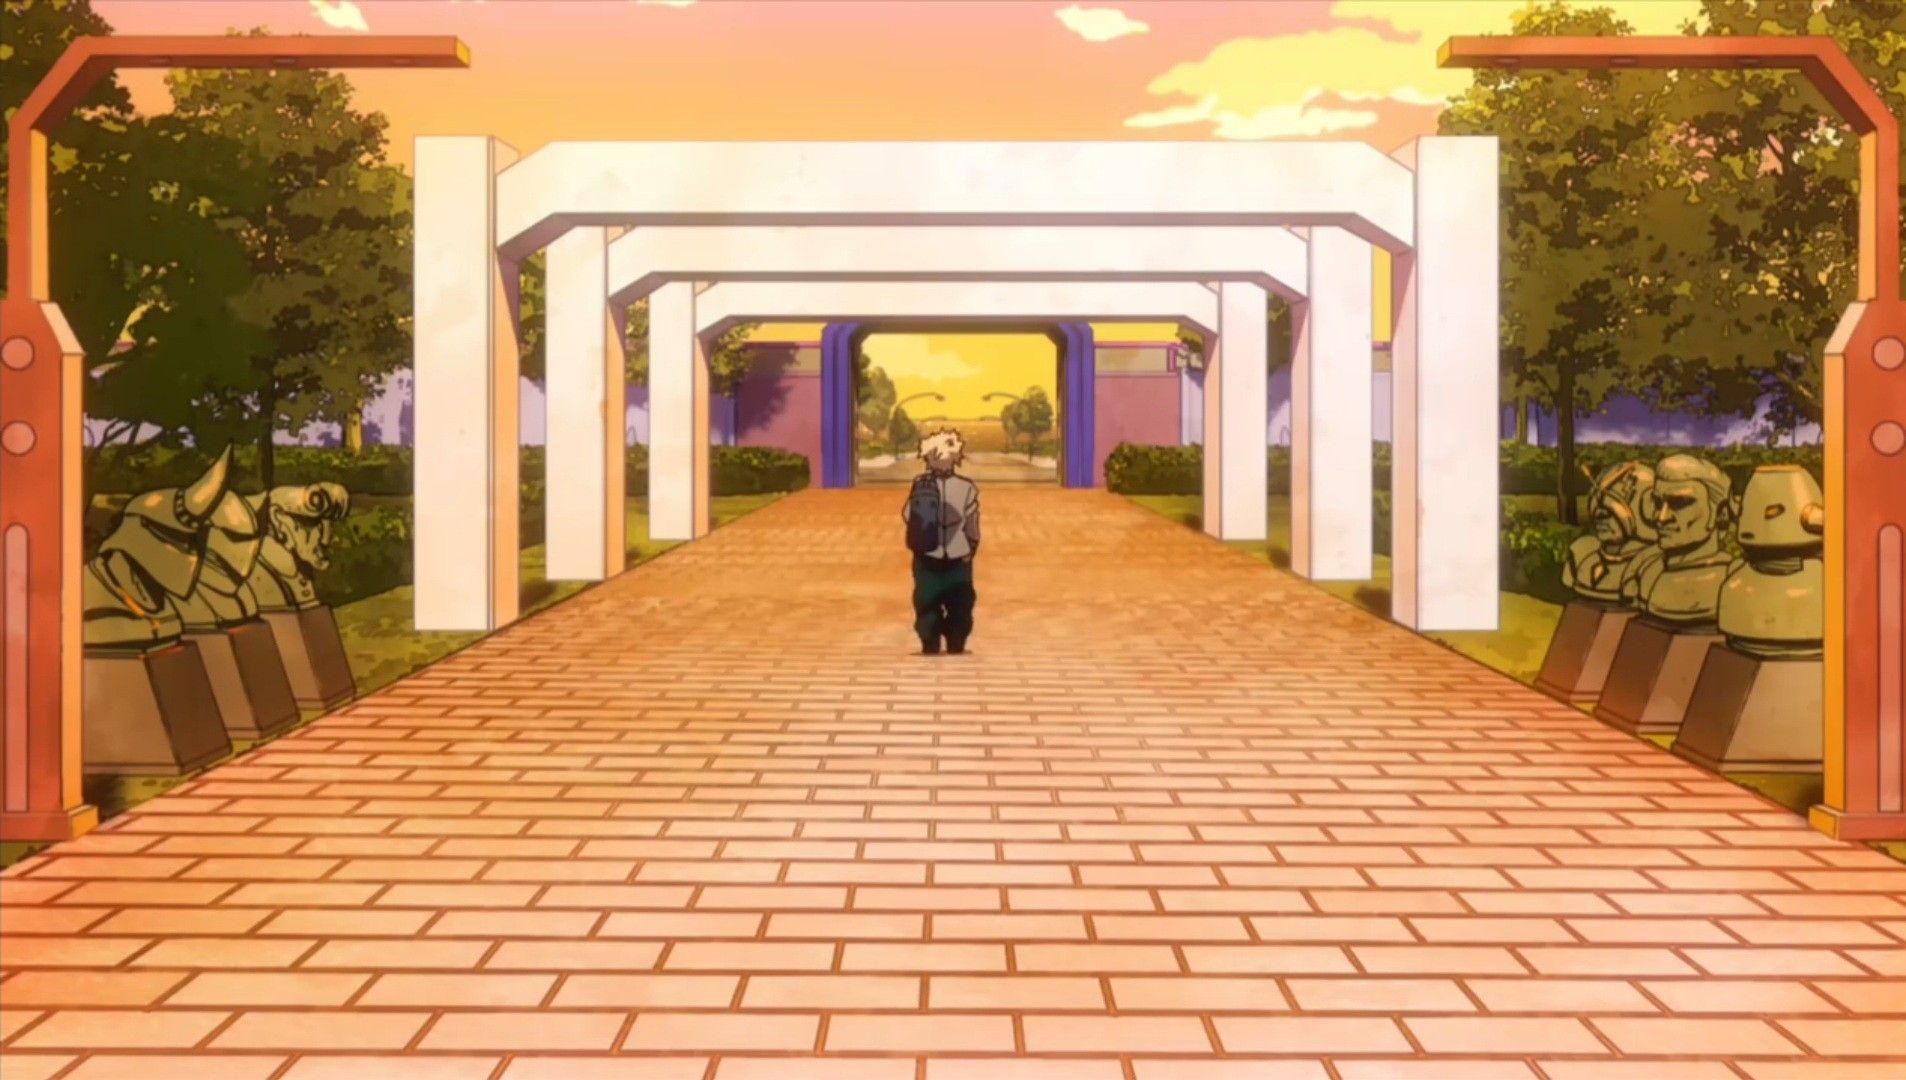 Boku No Hero Escenario Entrada Ua Cool Illusions Dream Anime Anime Scenery